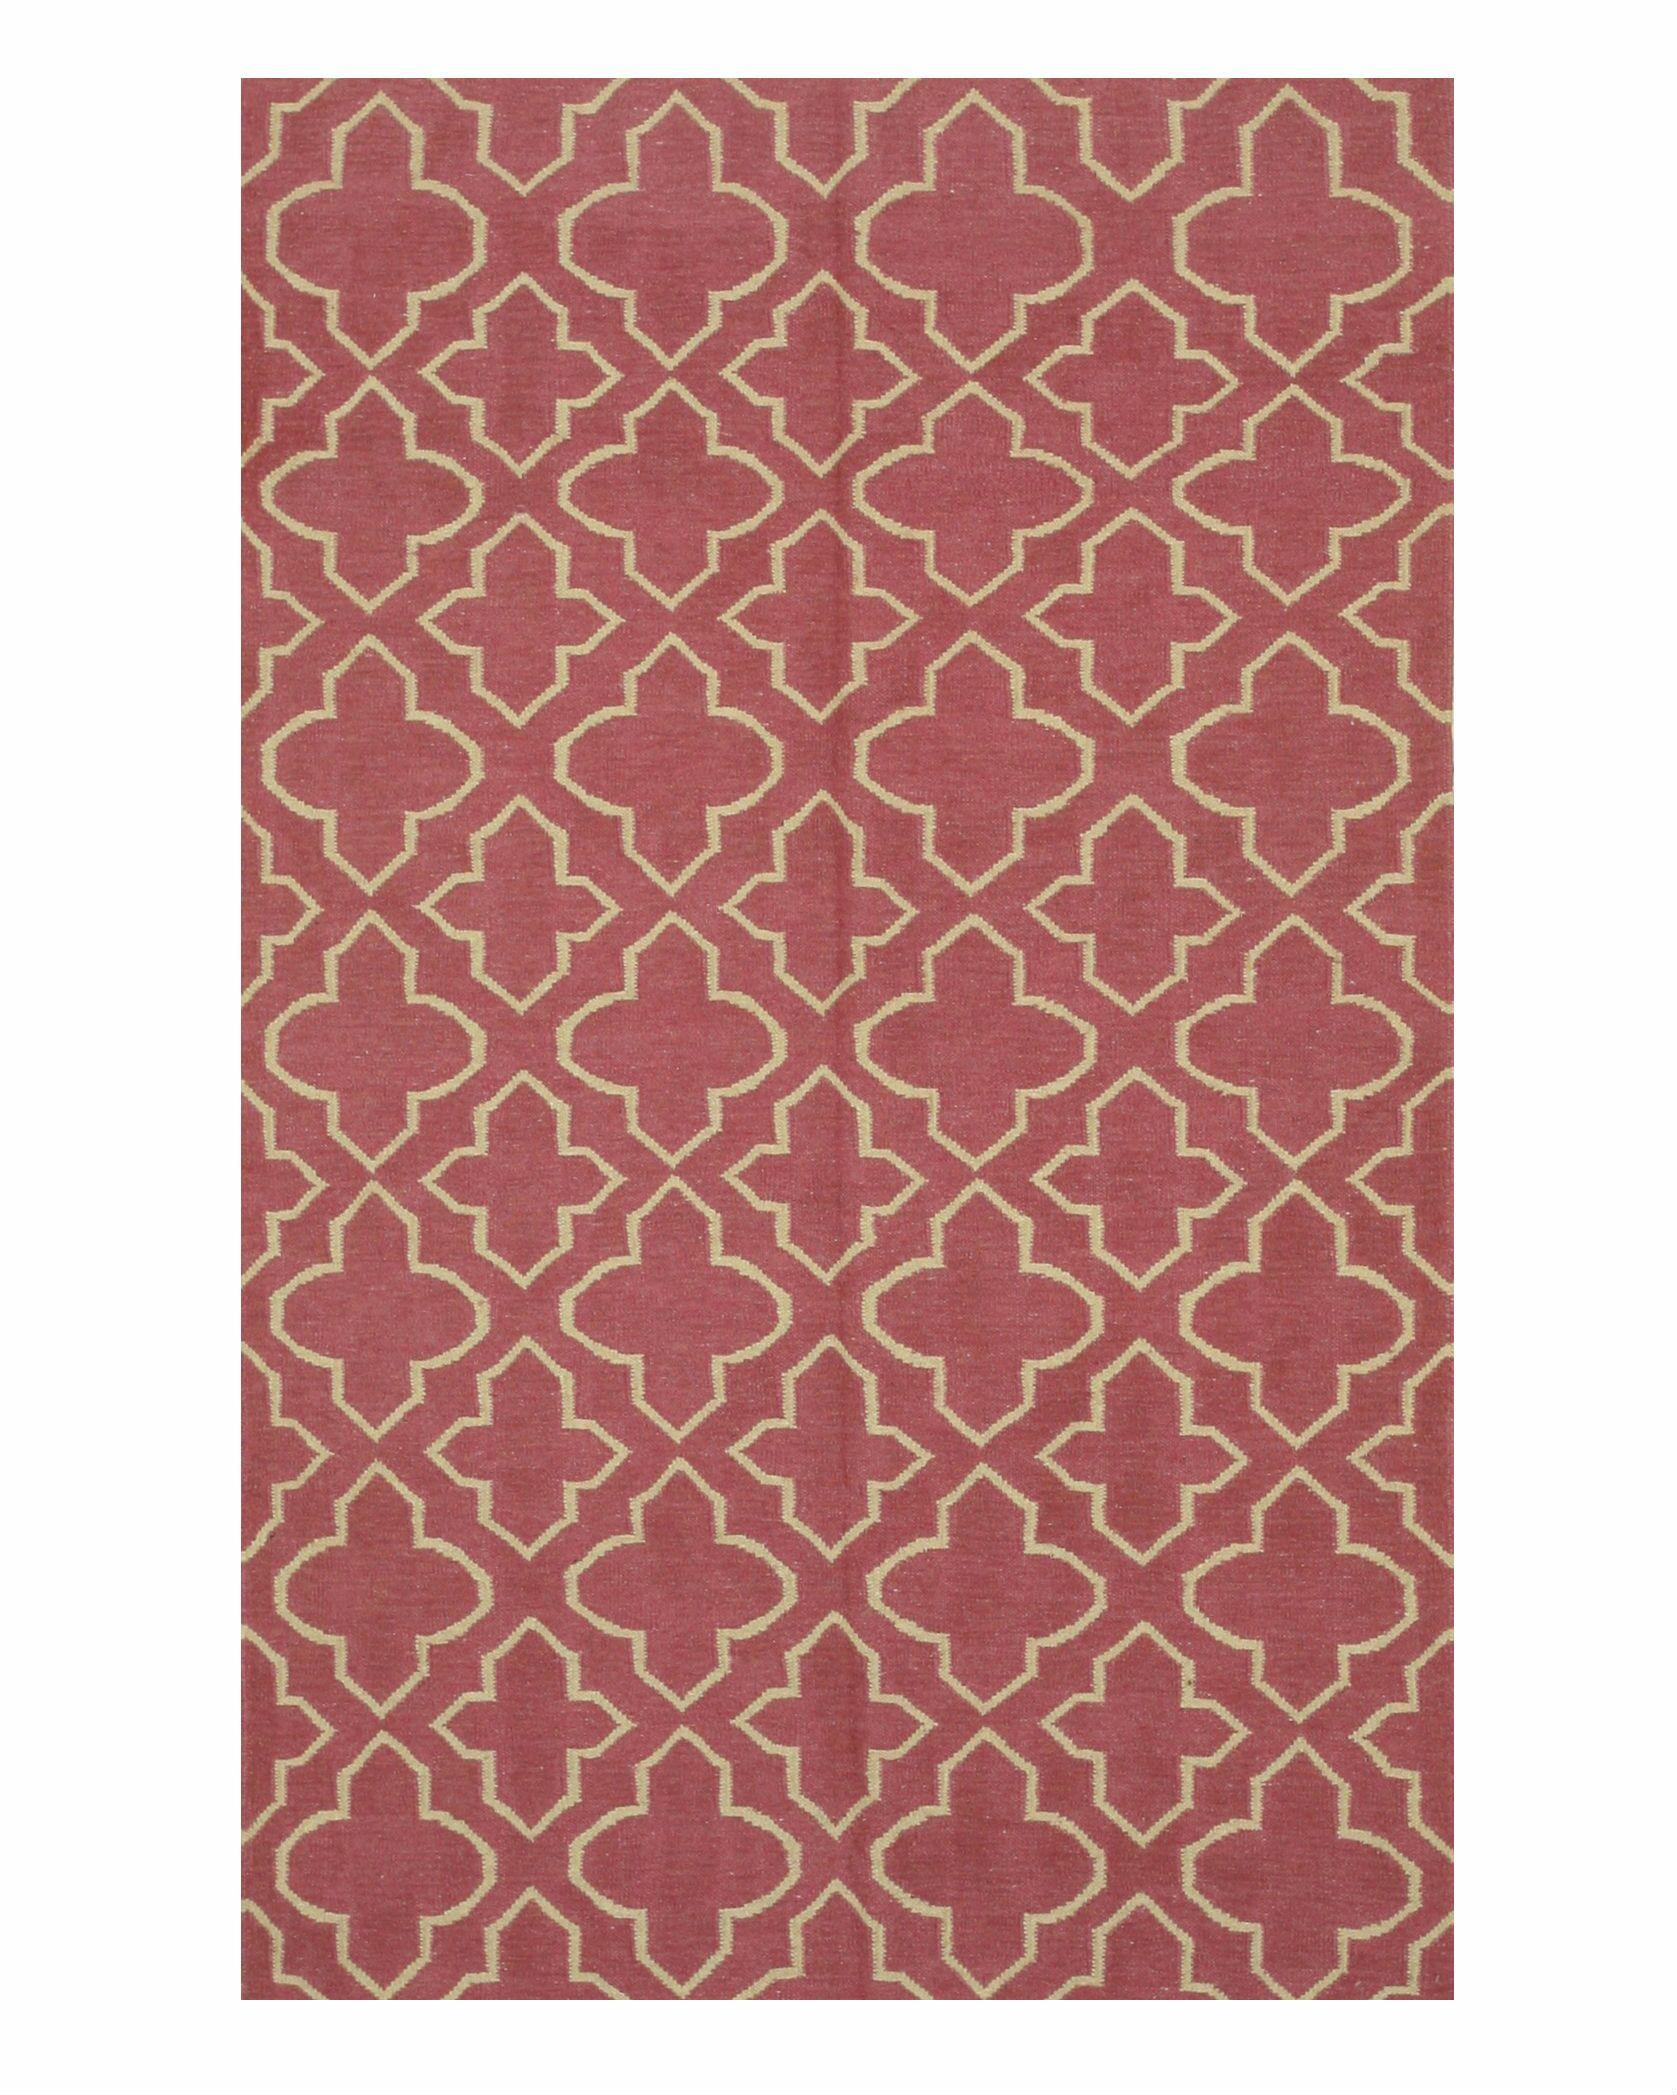 Durrant Handmade Pink Area Rug Rug Size: 9' x 12'